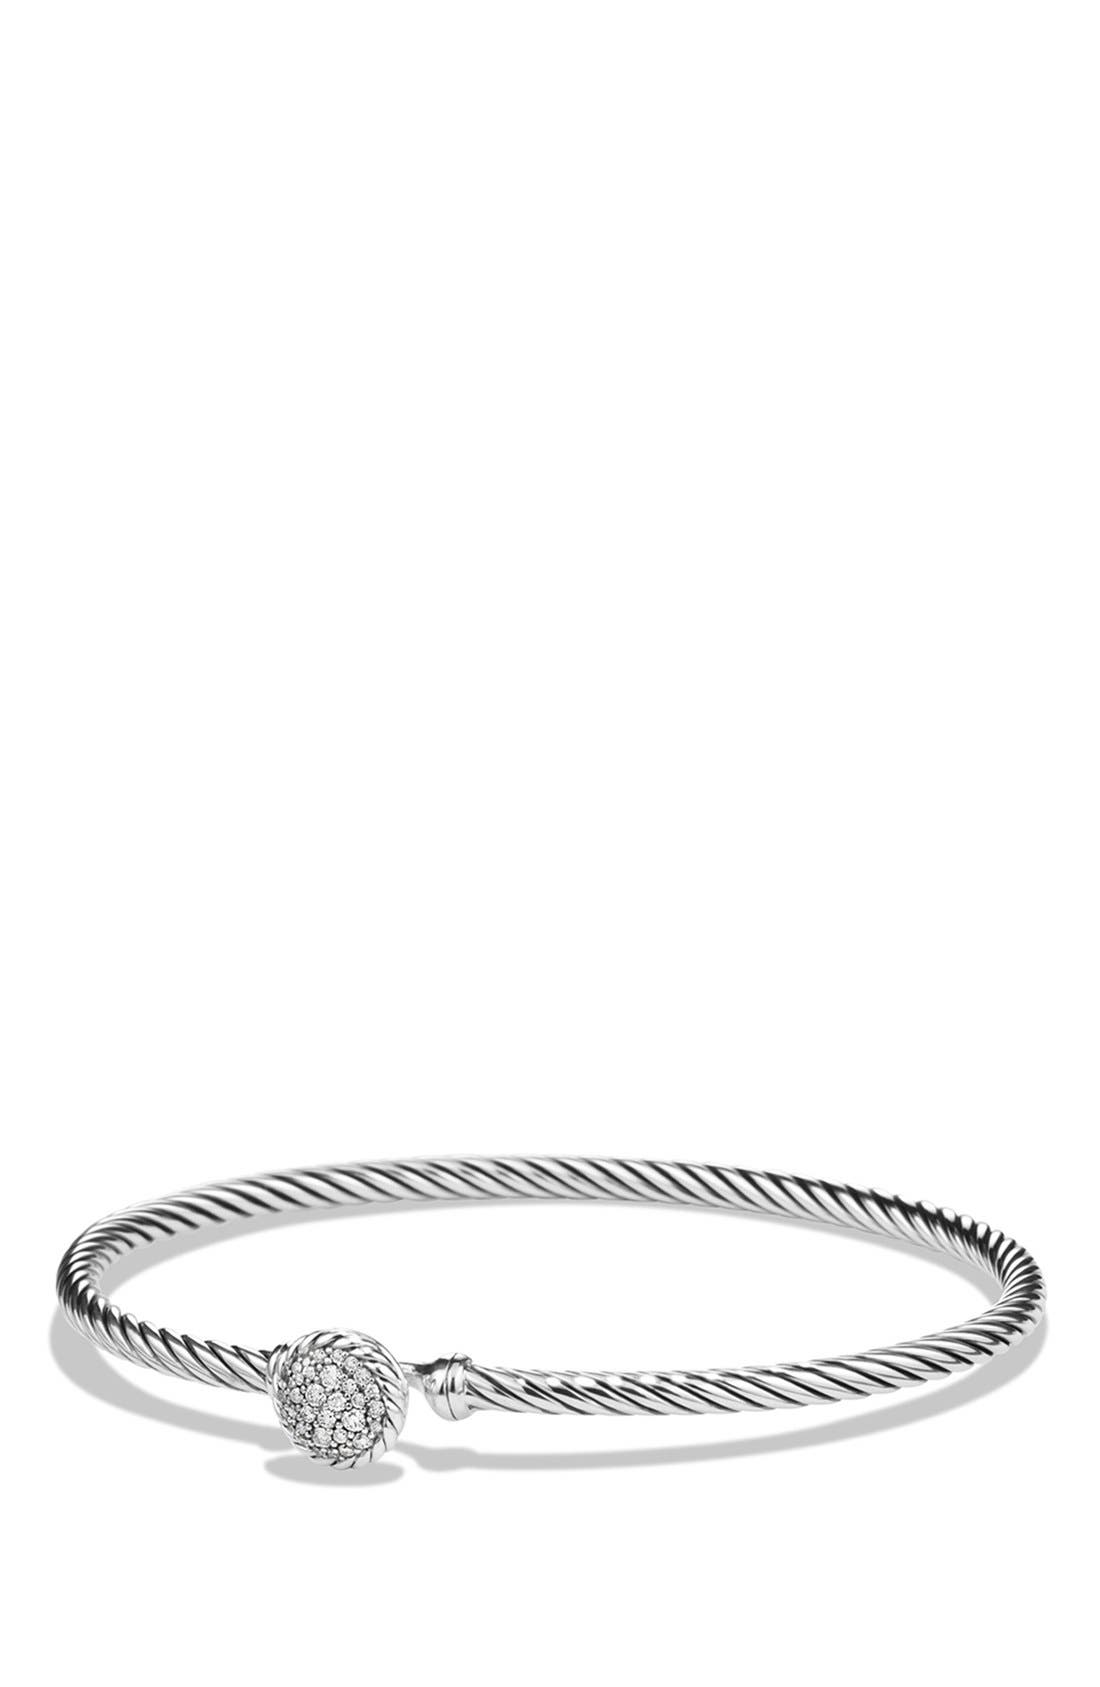 DAVID YURMAN Châtelaine Bracelet with Diamonds